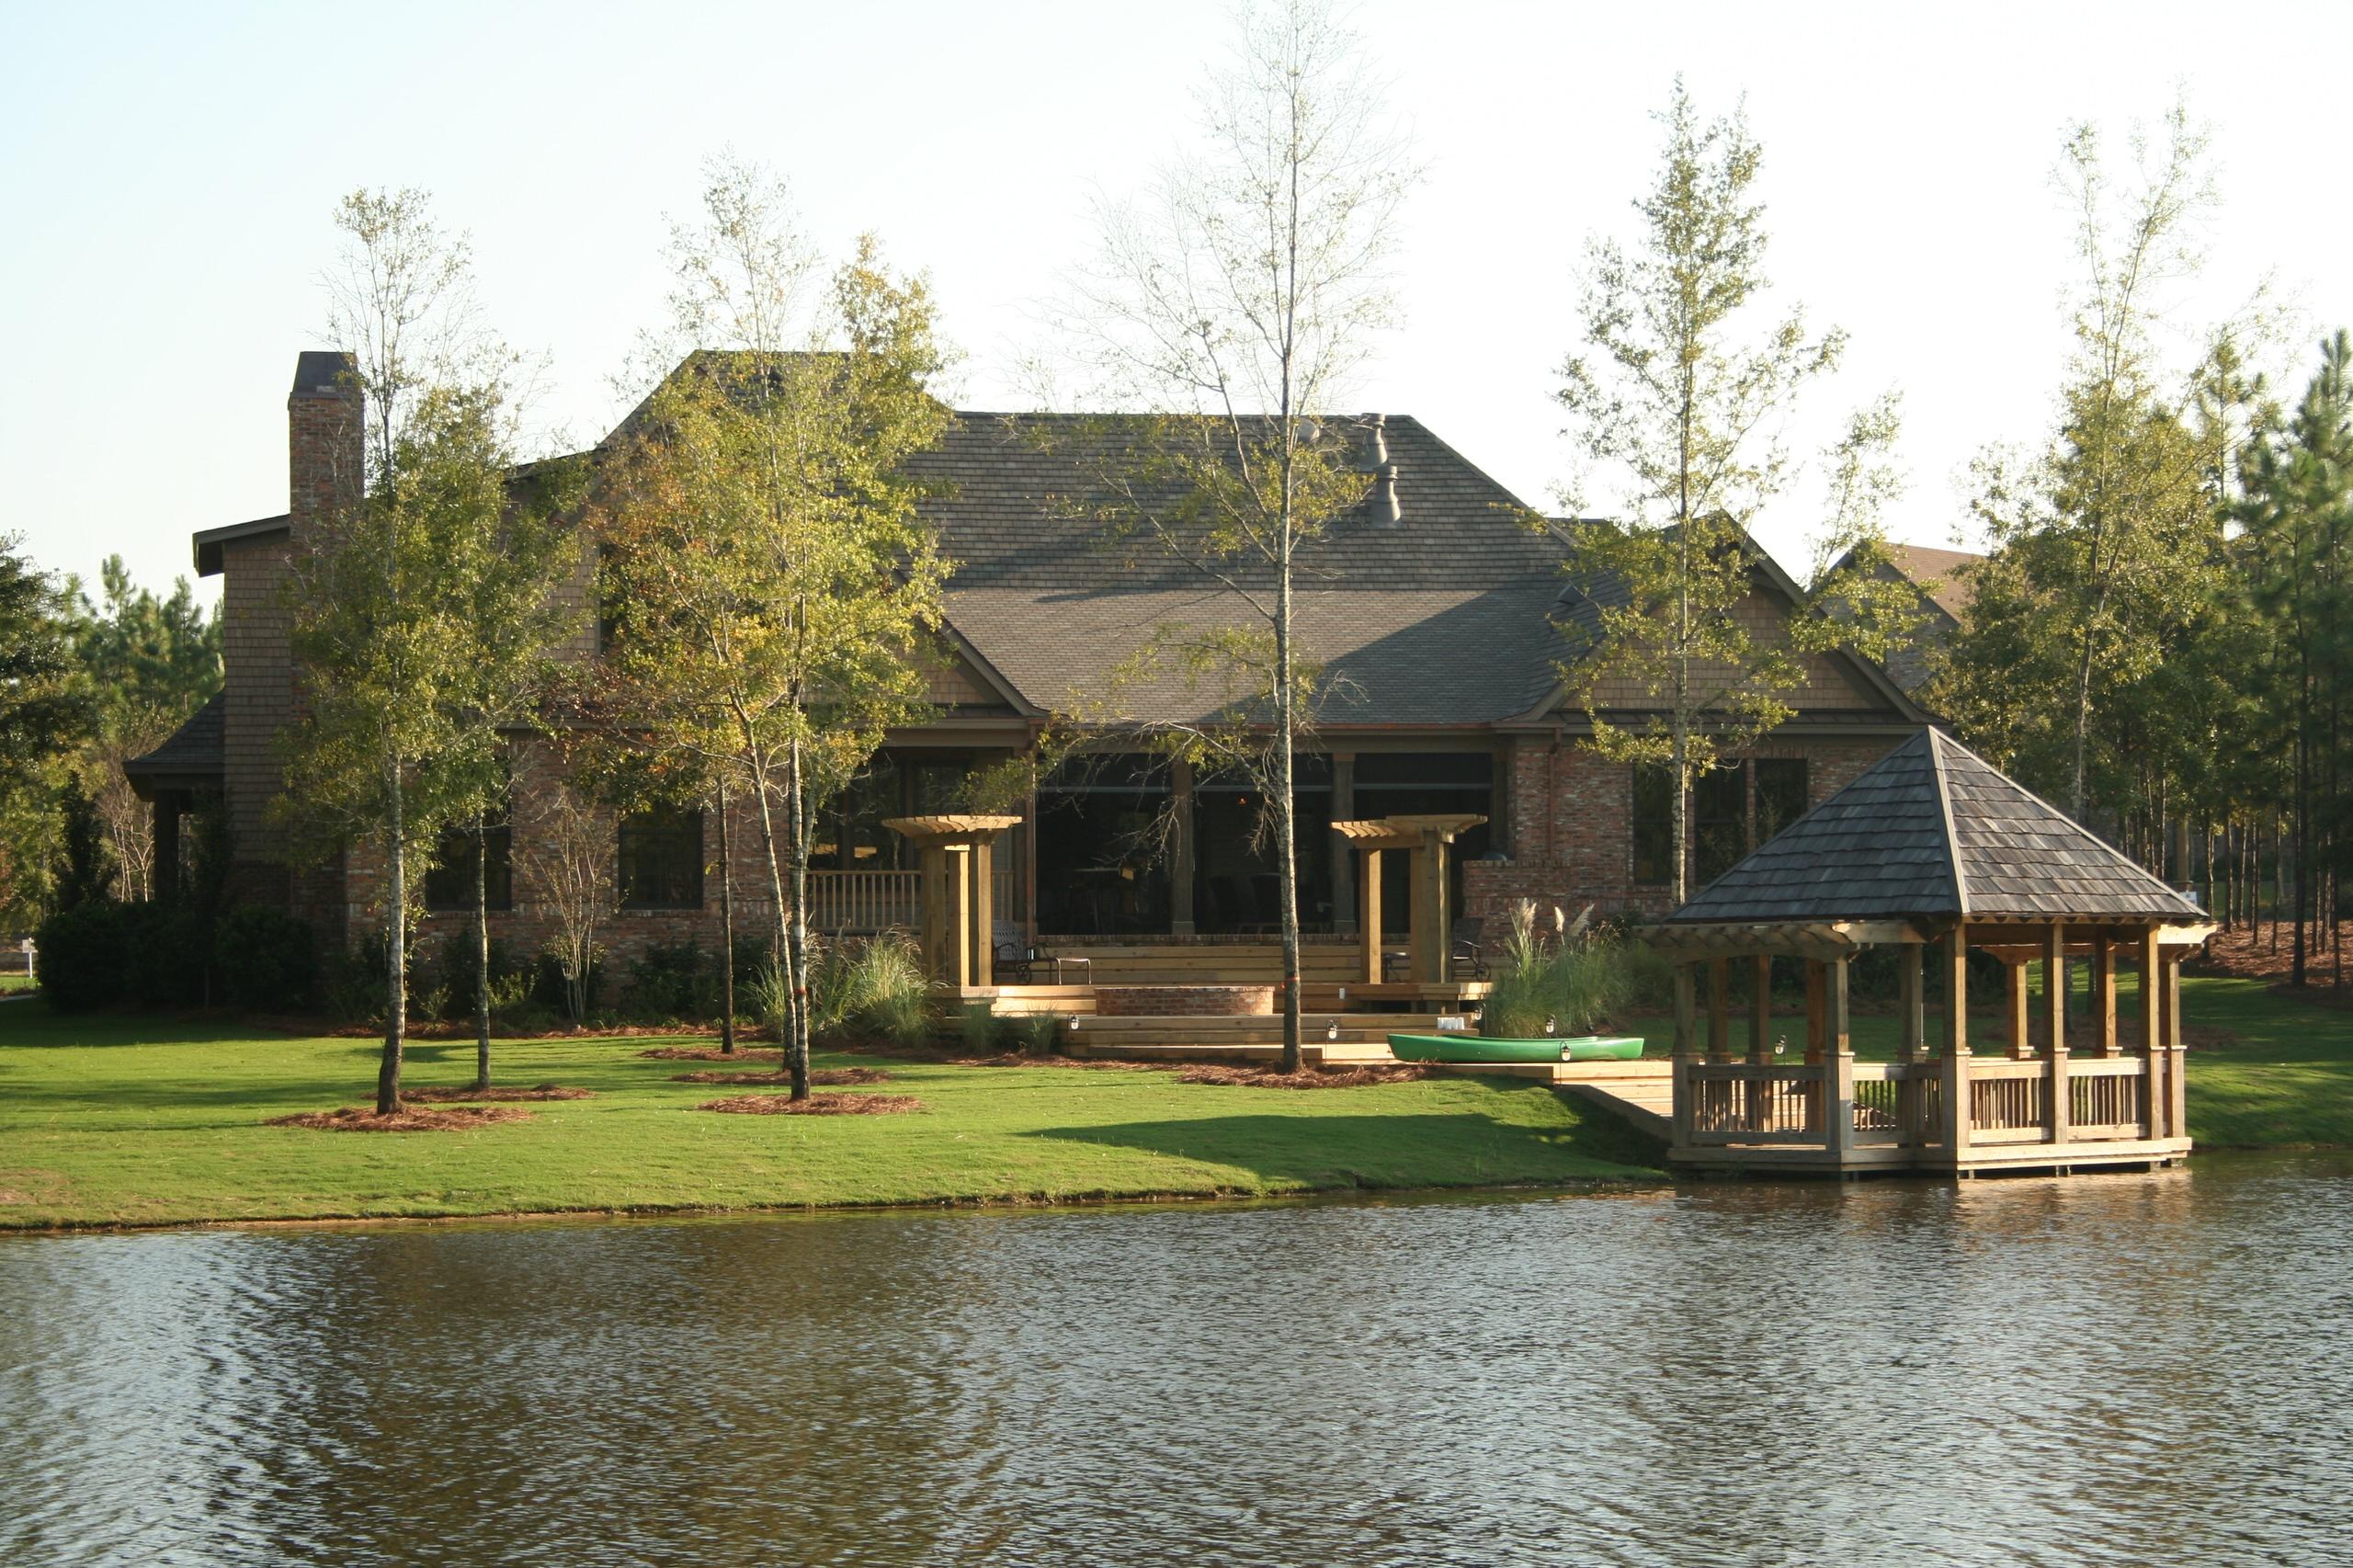 Fairhope, Alabama's 2008 Showcase Home